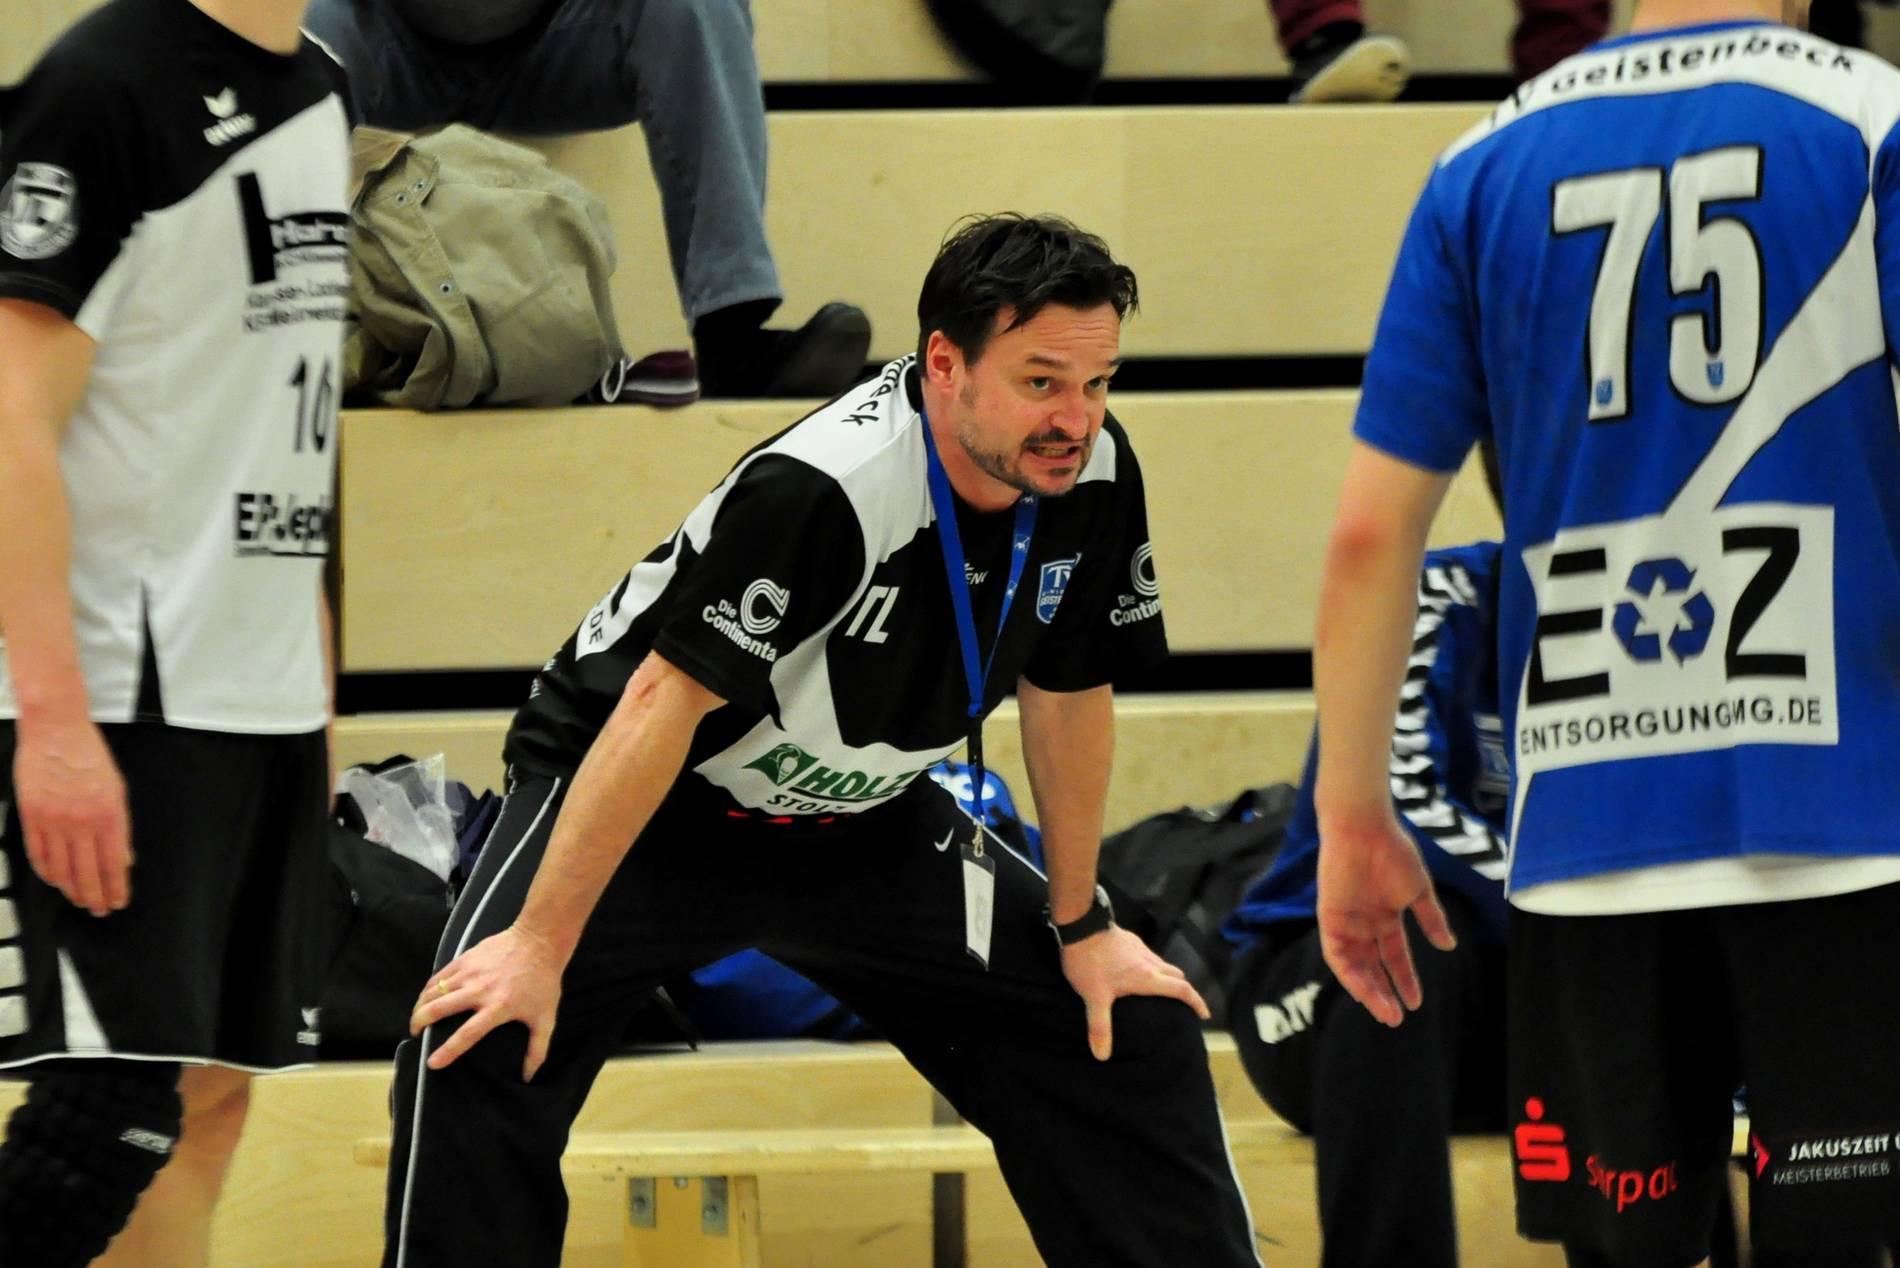 handball niederrhein